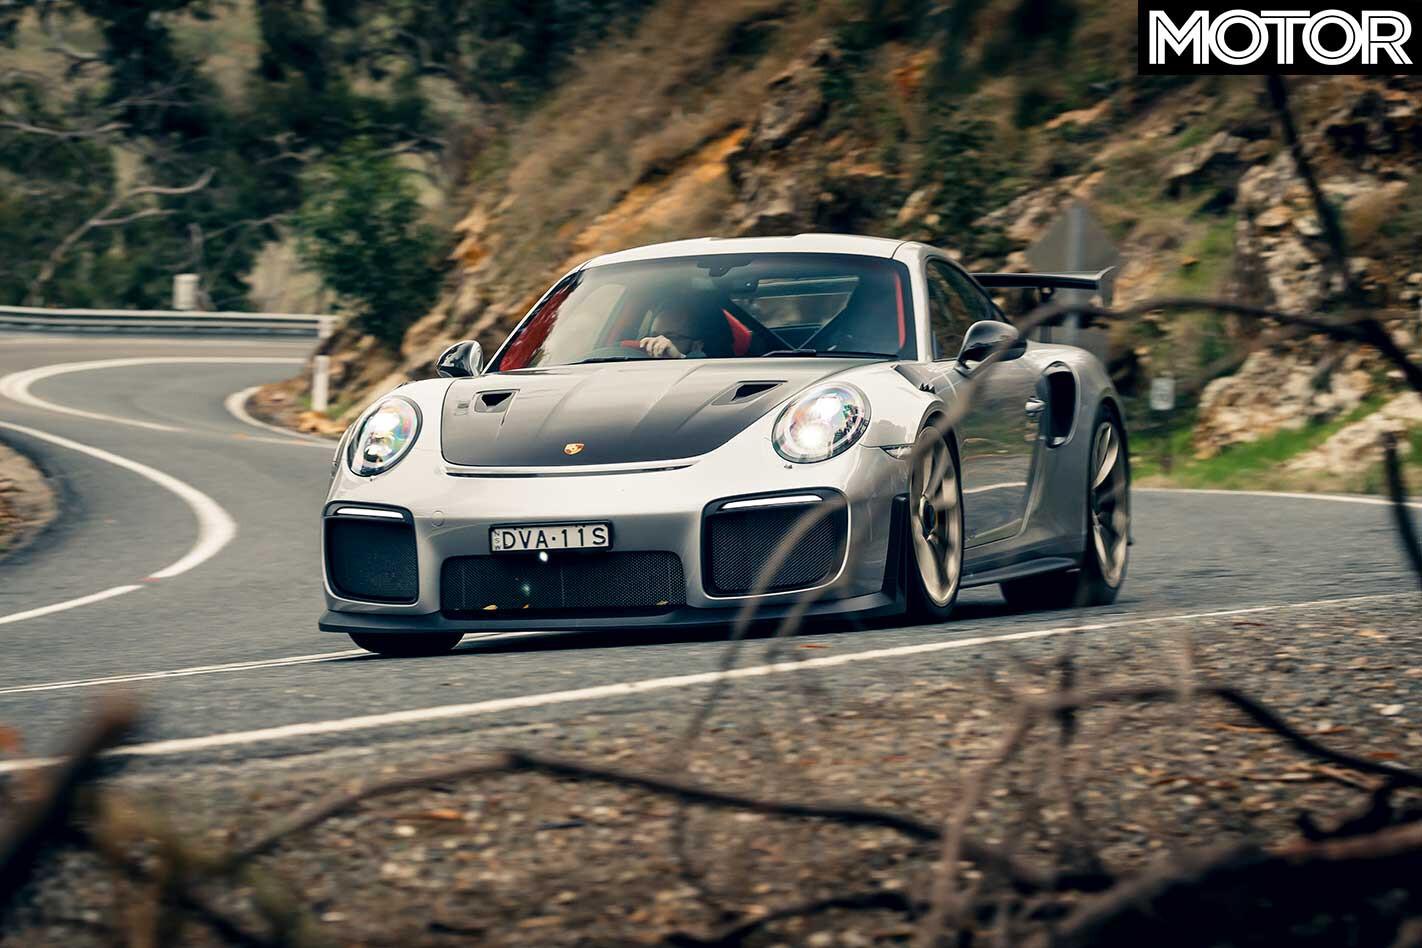 MOTOR PCOTY 2019 Porsche 911 GT 2 RS Jpg